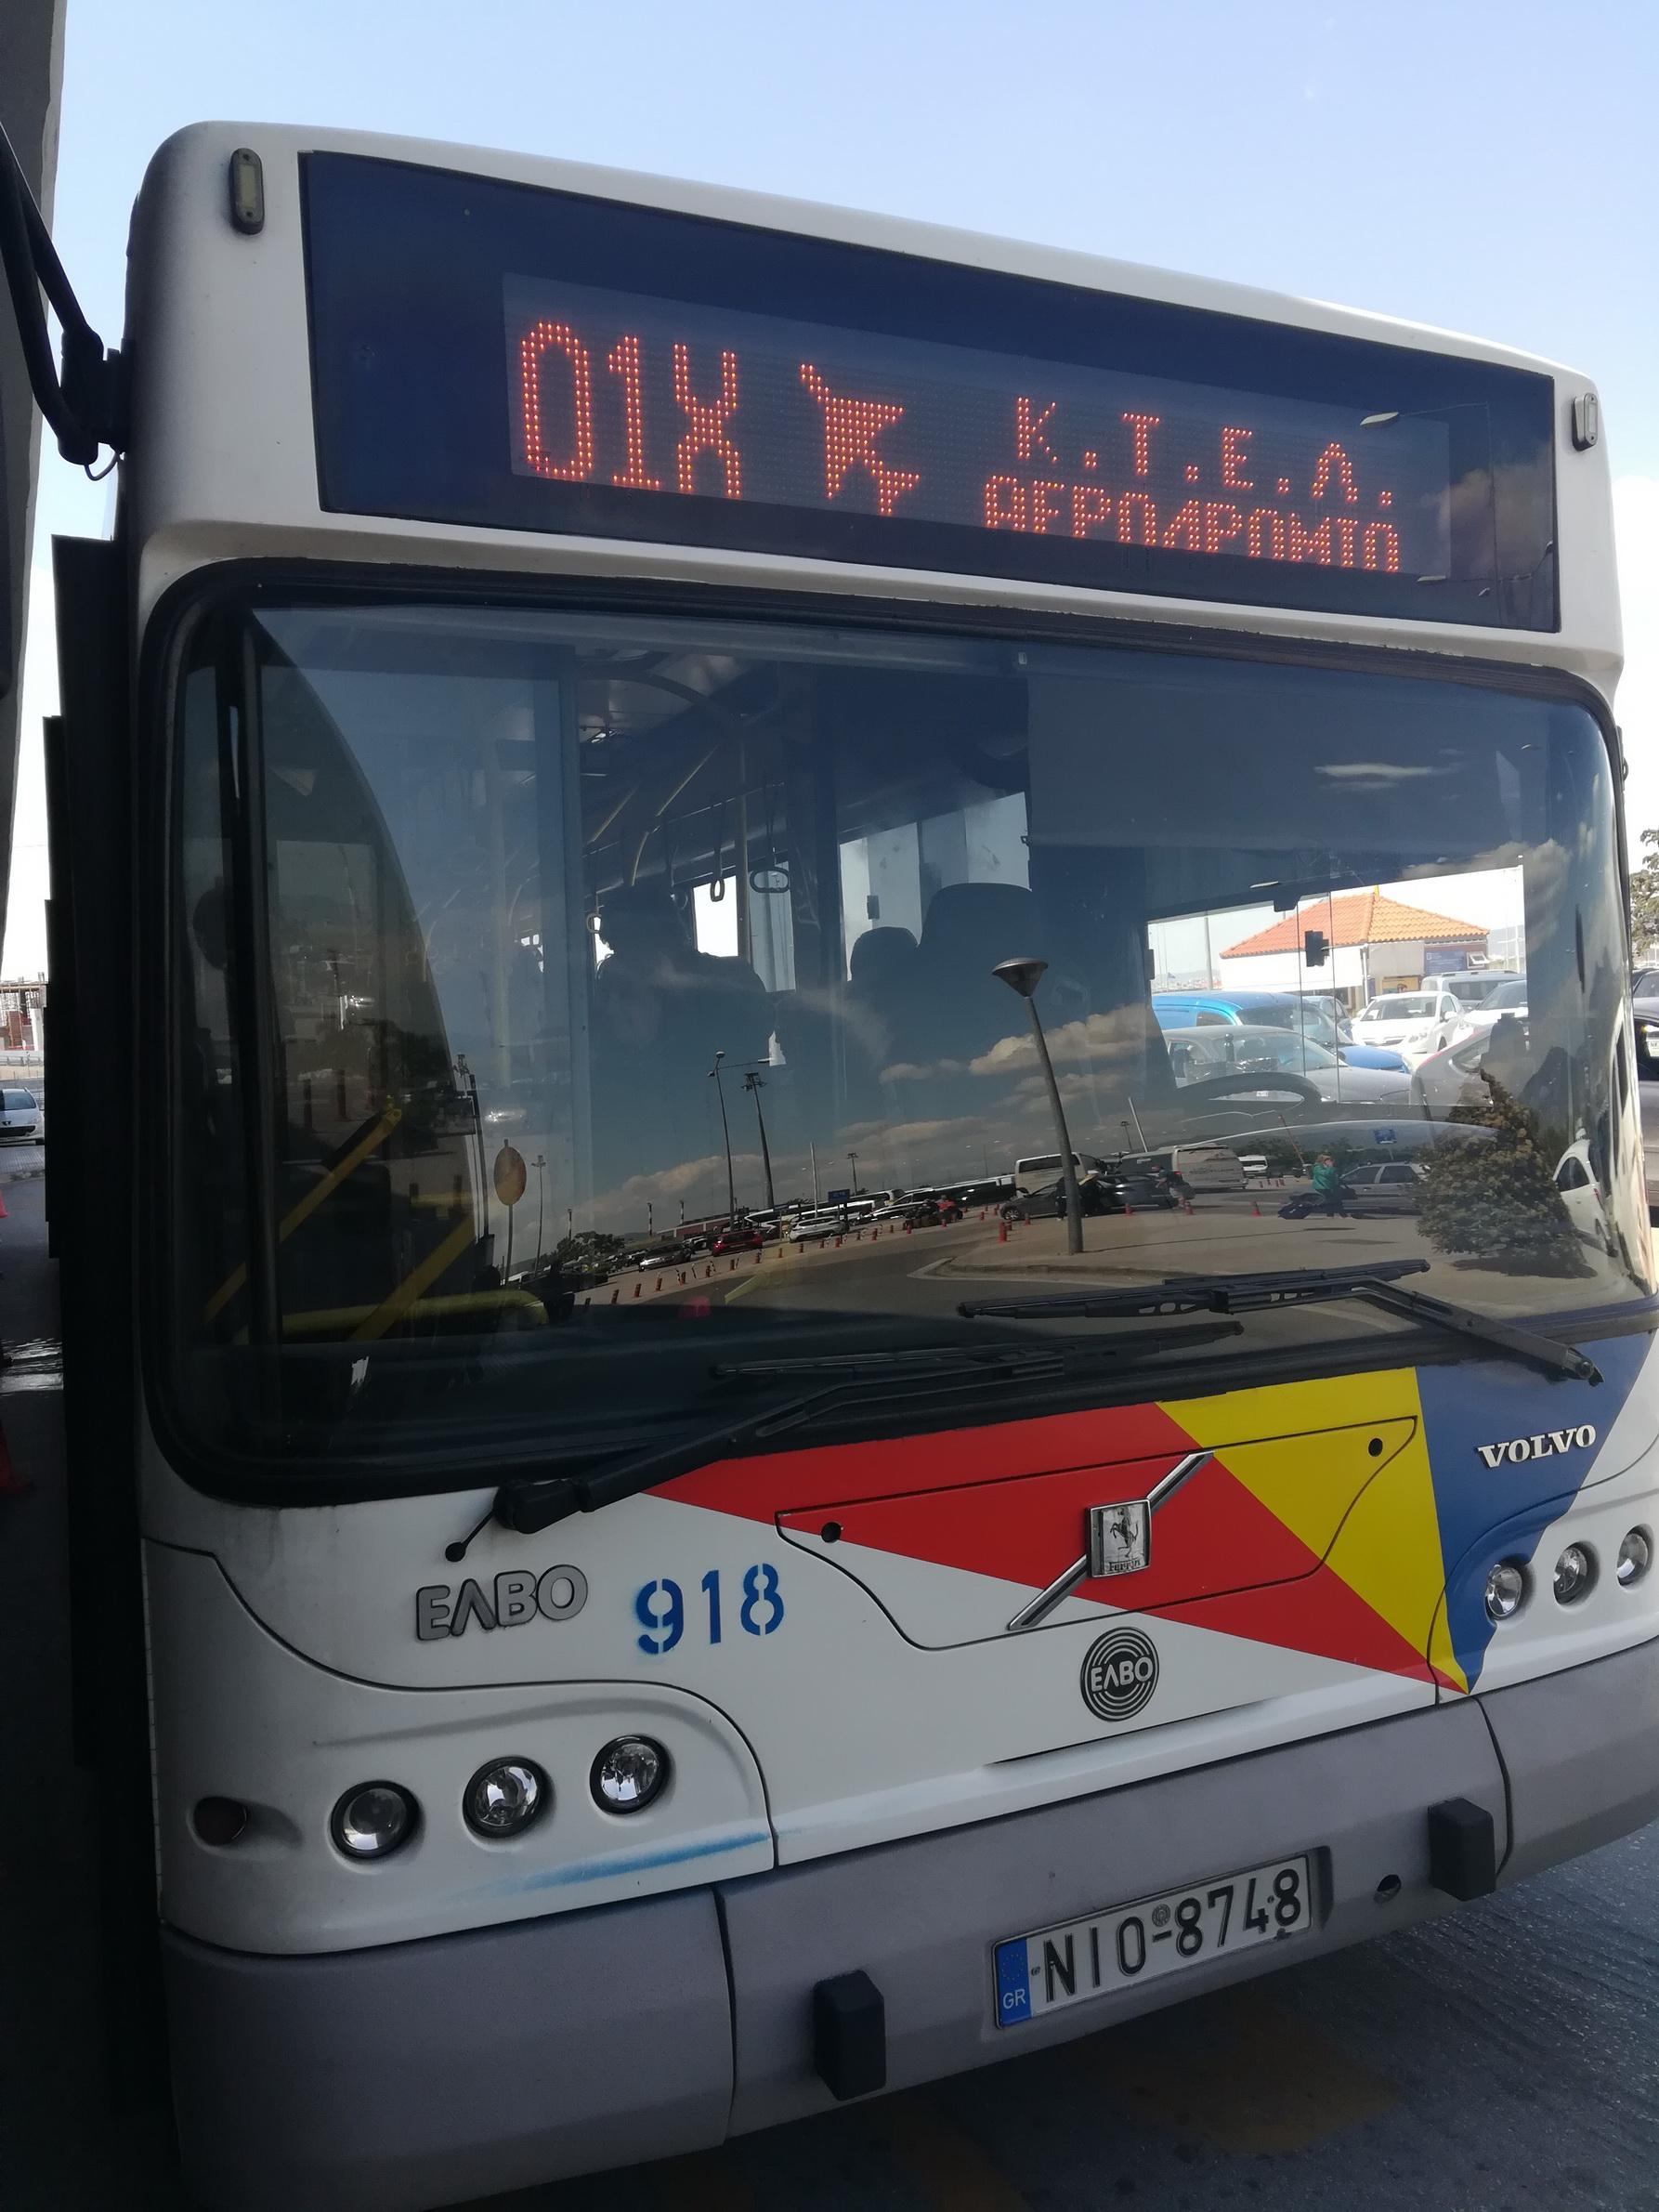 airport bus, express bus, public transportation, thessaloniki